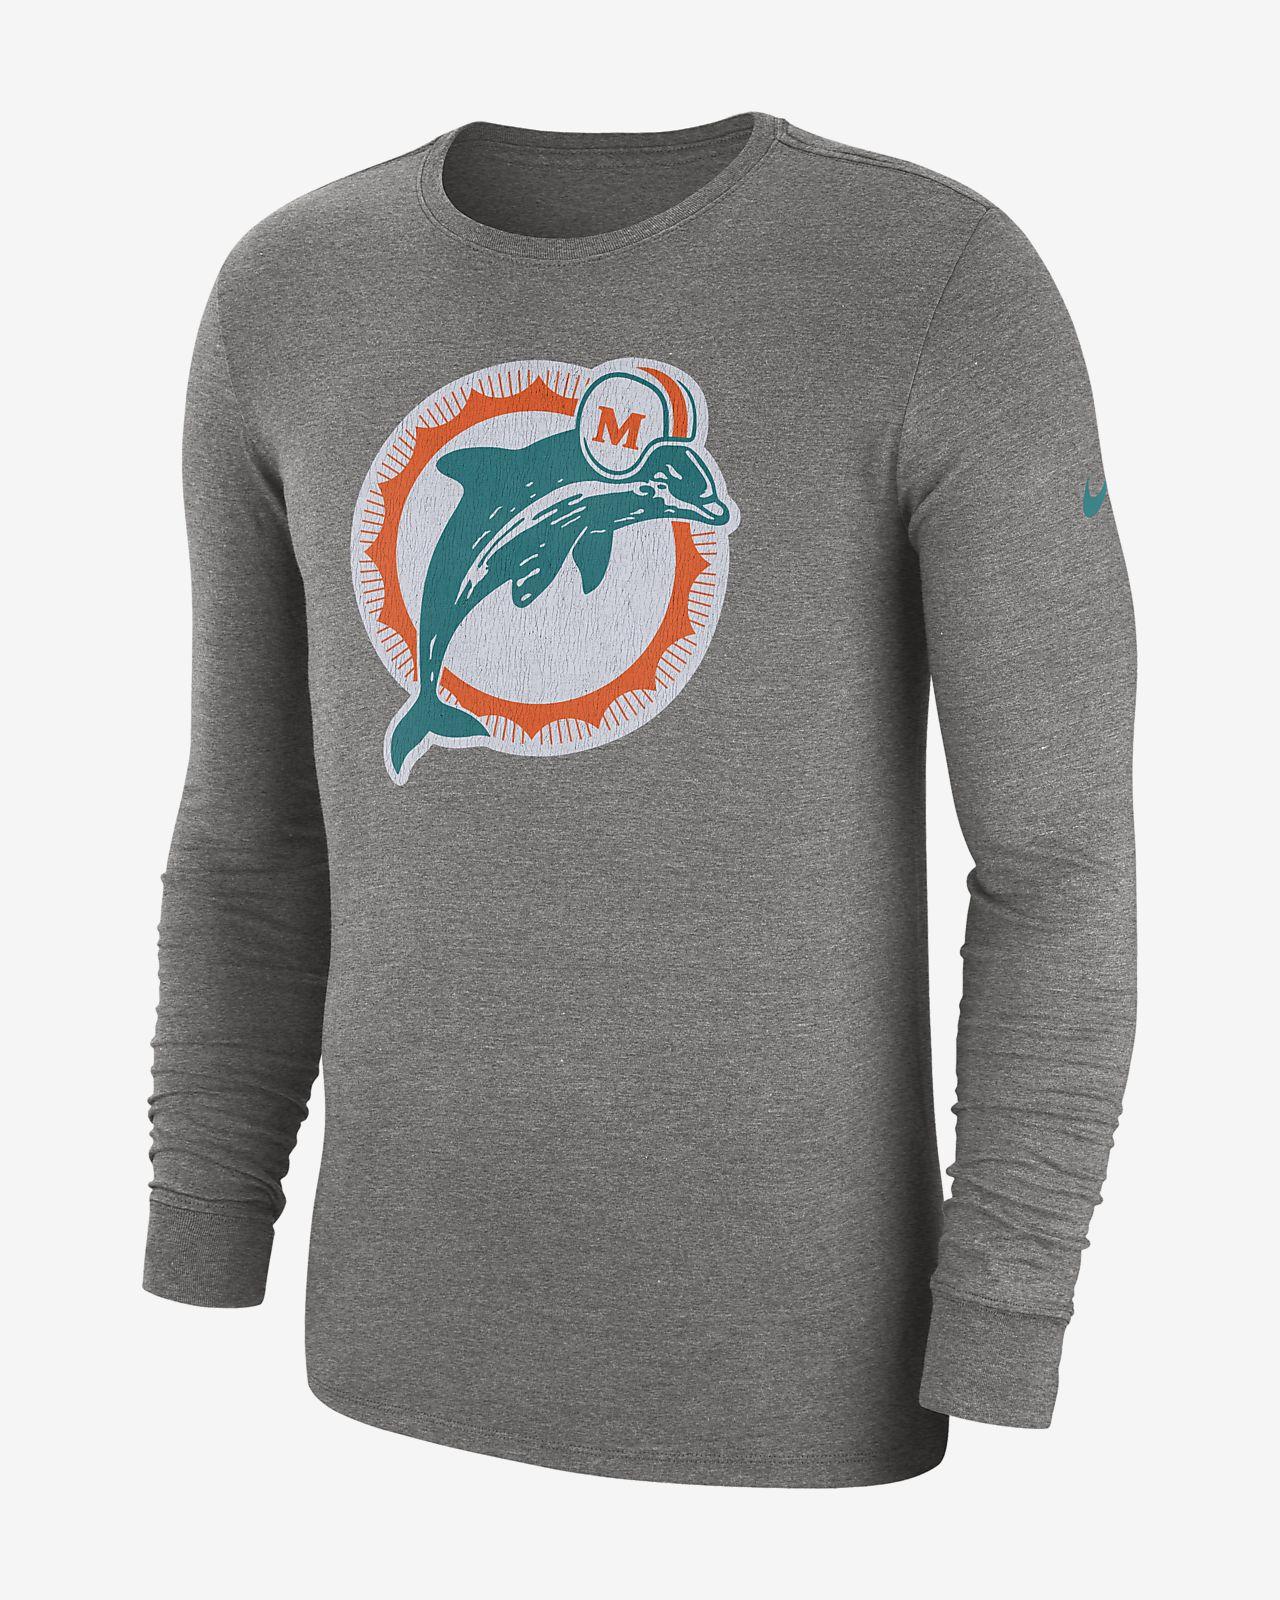 Nike (NFL Dolphins) Men's Tri-Blend Long-Sleeve T-Shirt